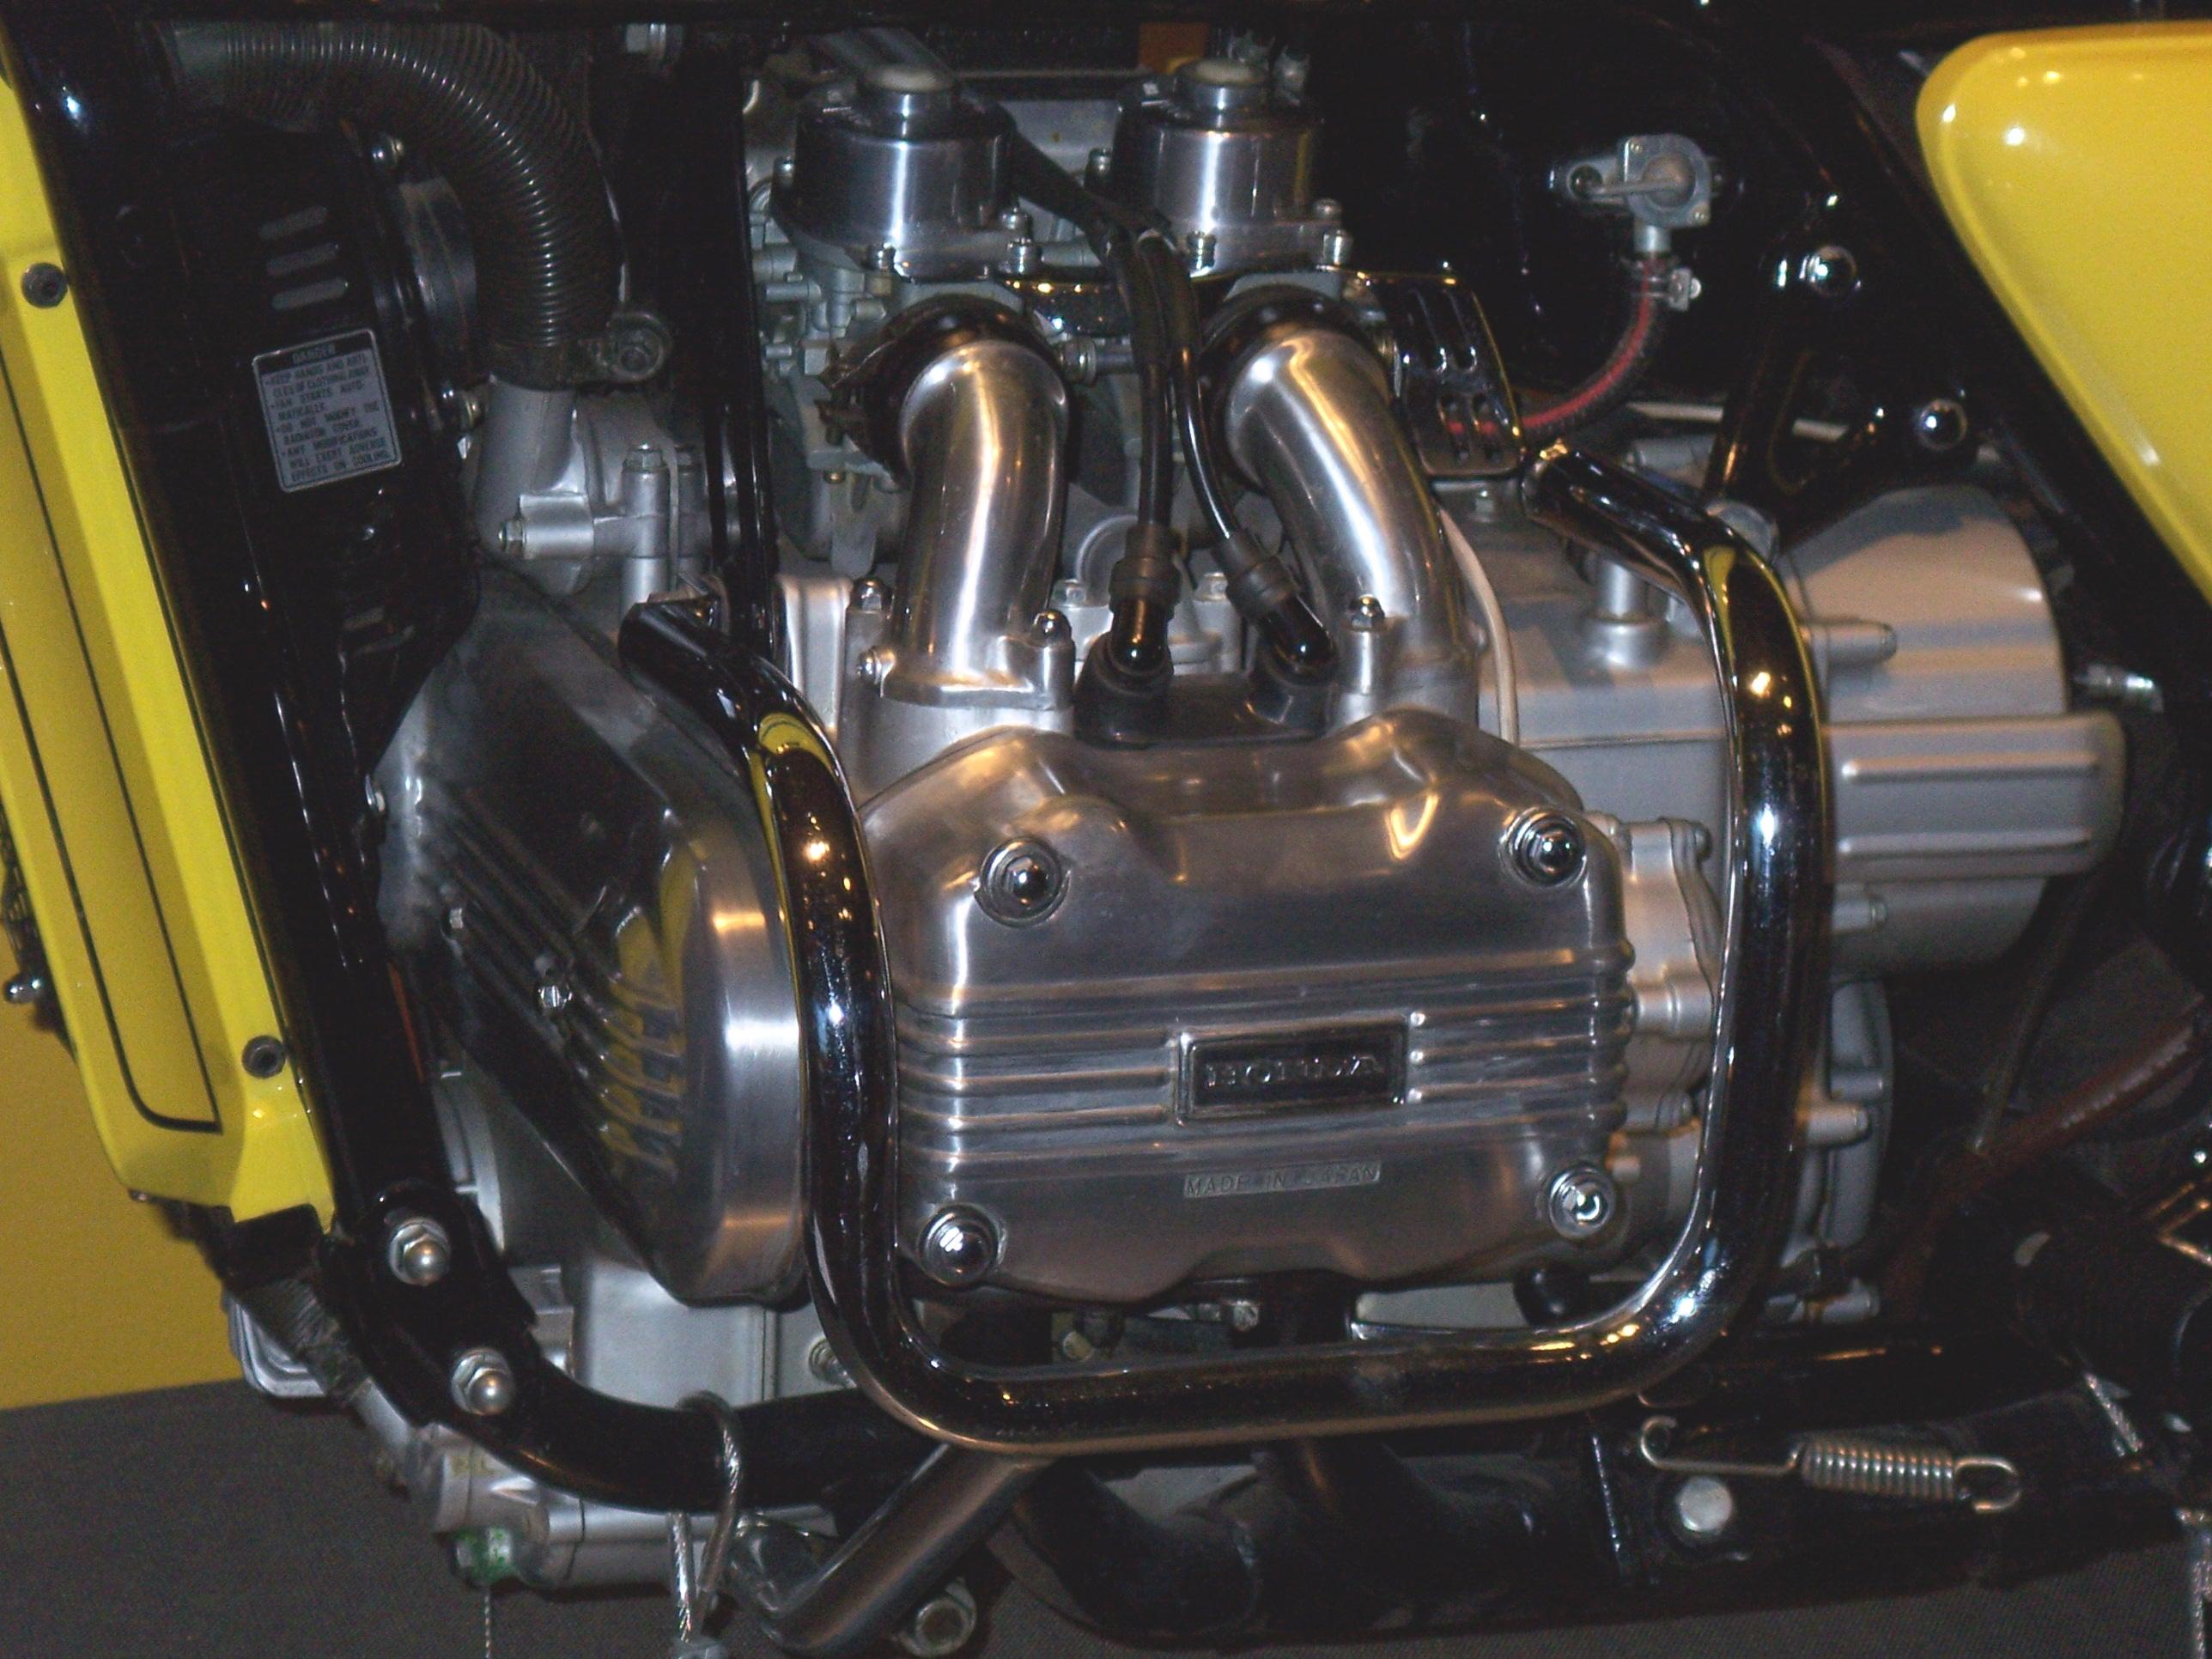 honda gl1000 engine internal diagram rotary engine internal diagram file:honda goldwing gl1000 engine closeup.jpg - wikimedia ...